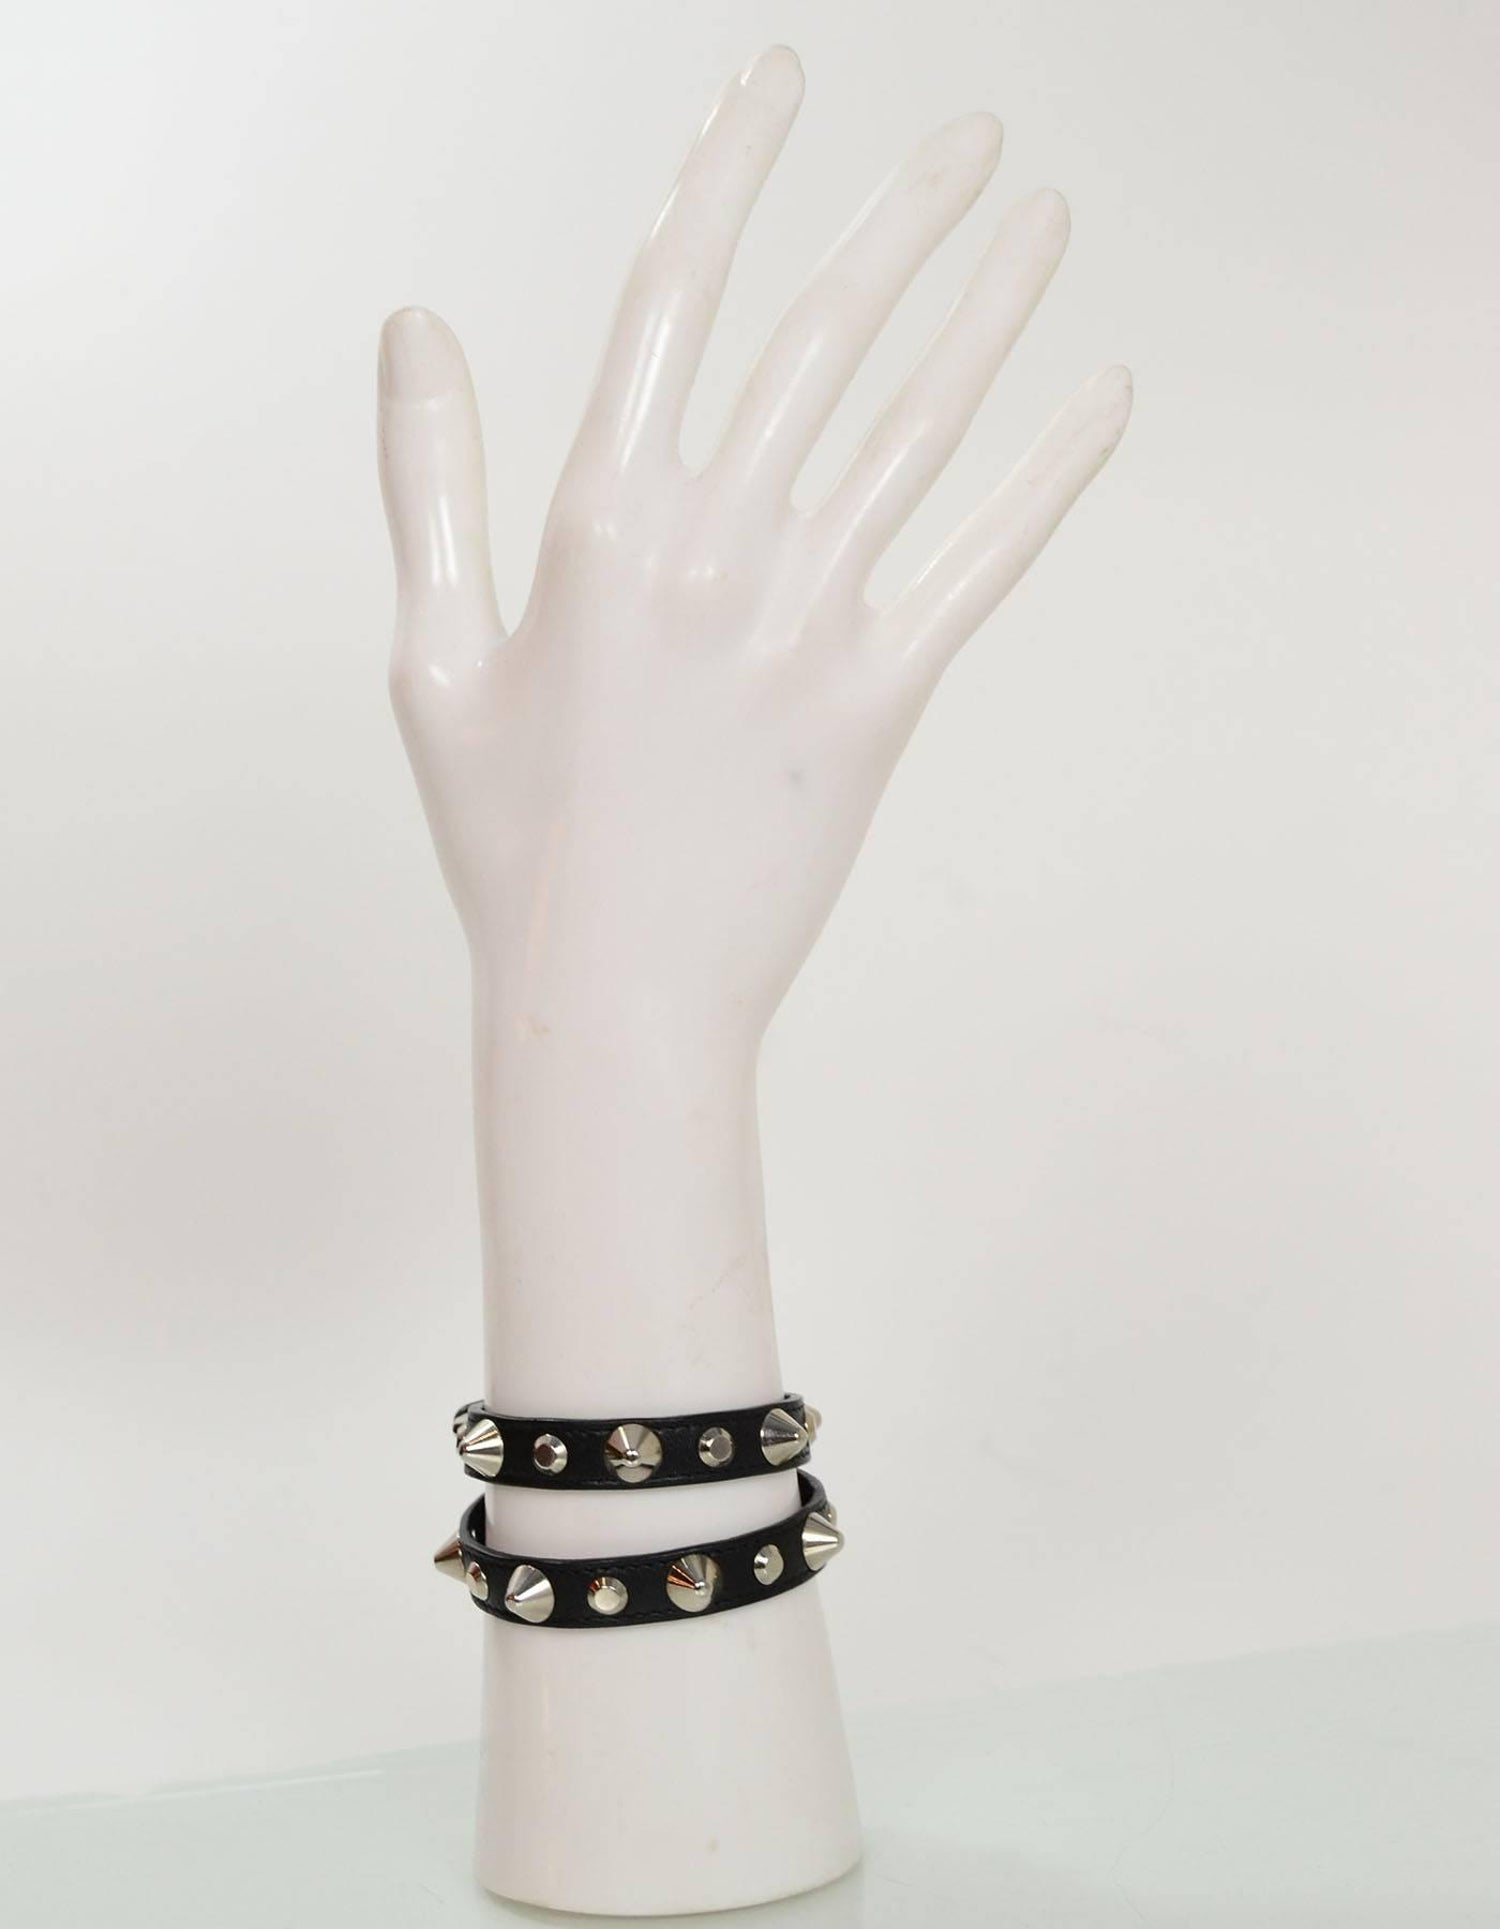 04bb8c441da Saint Laurent Black Leather Studded Choker/Bracelet For Sale at 1stdibs